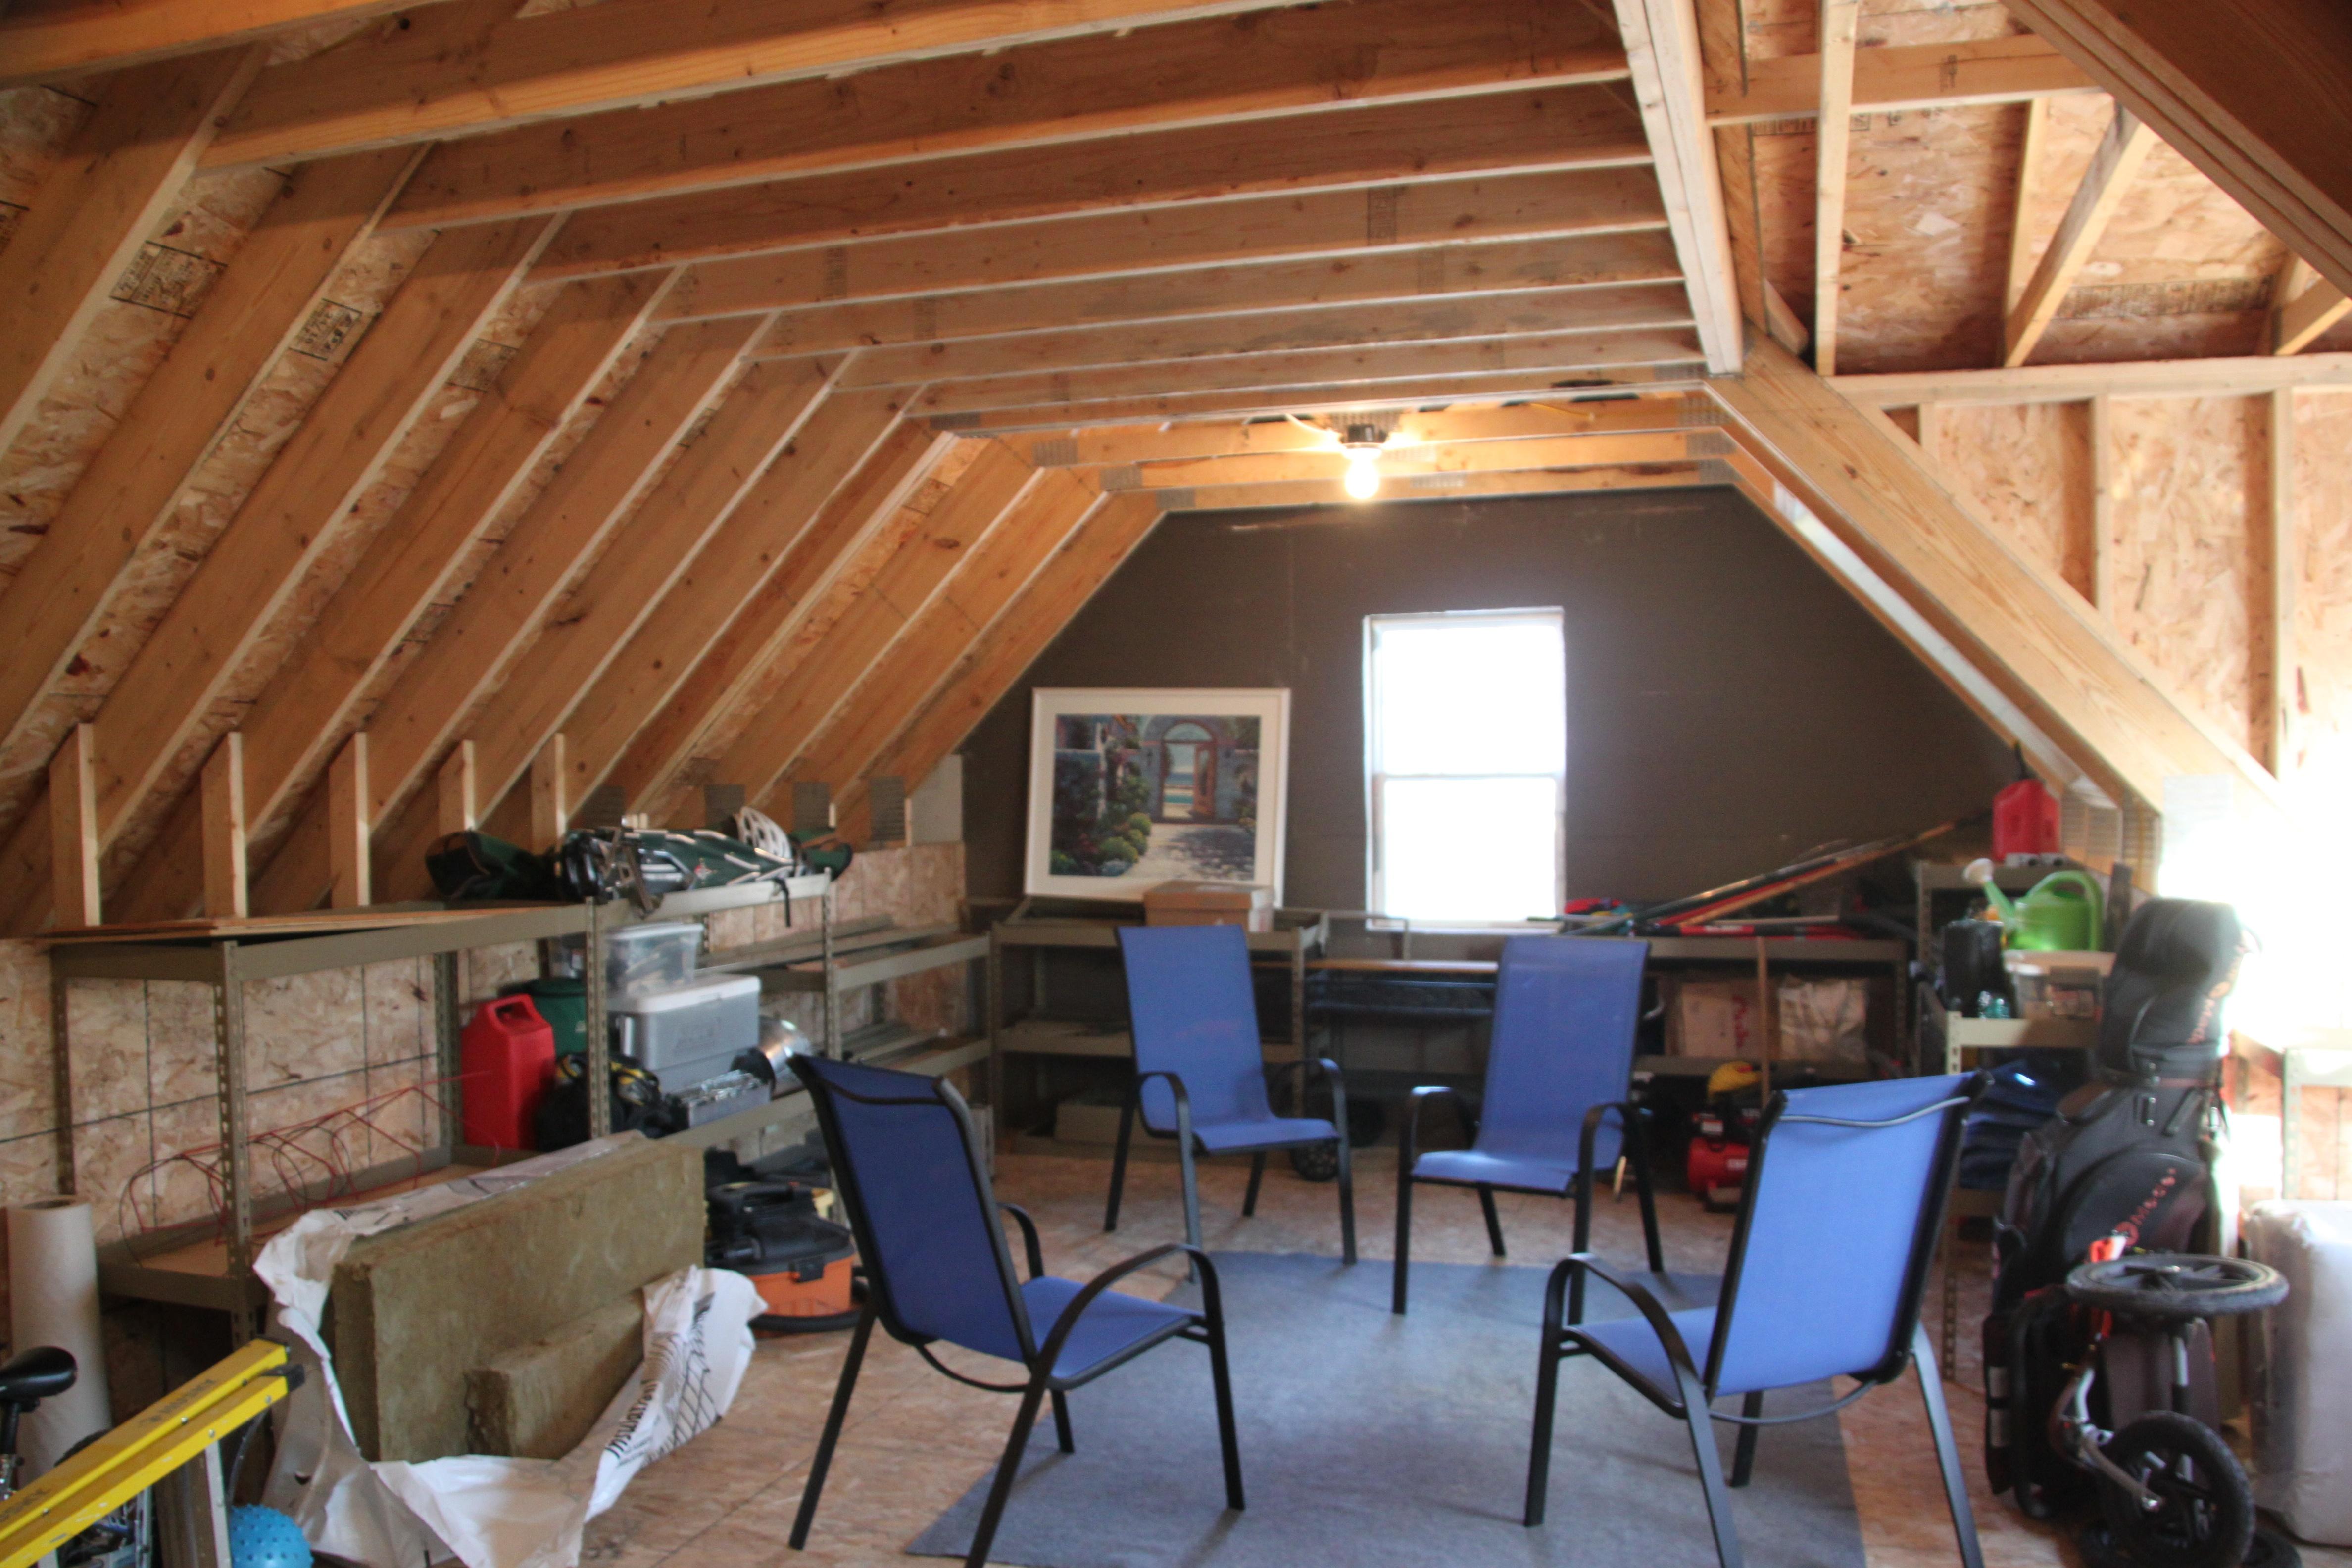 Cost To Finish Attic Above Garage Home Plans Design Collection & Cost To Finish Attic Above Garage - Garage Designs